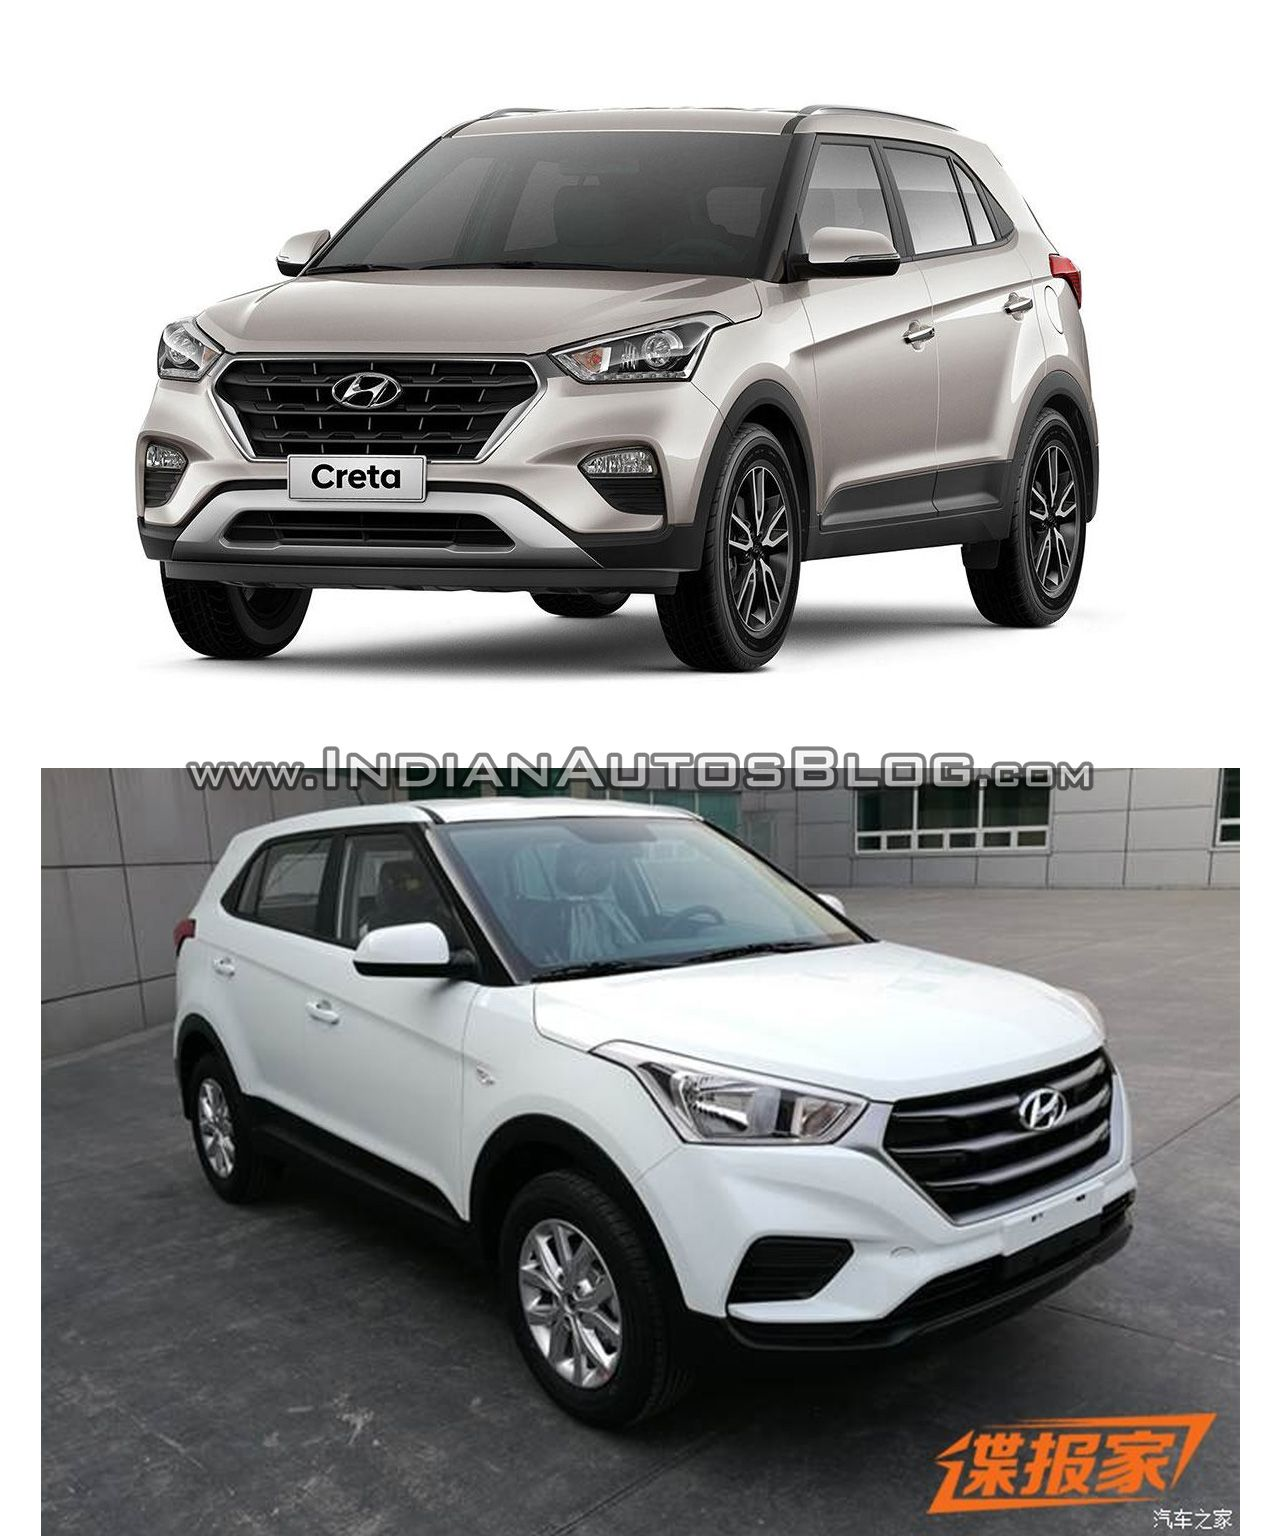 Brazilian Hyundai Creta Vs Hyundai Creta Facelift From China In Images China Image Automobile